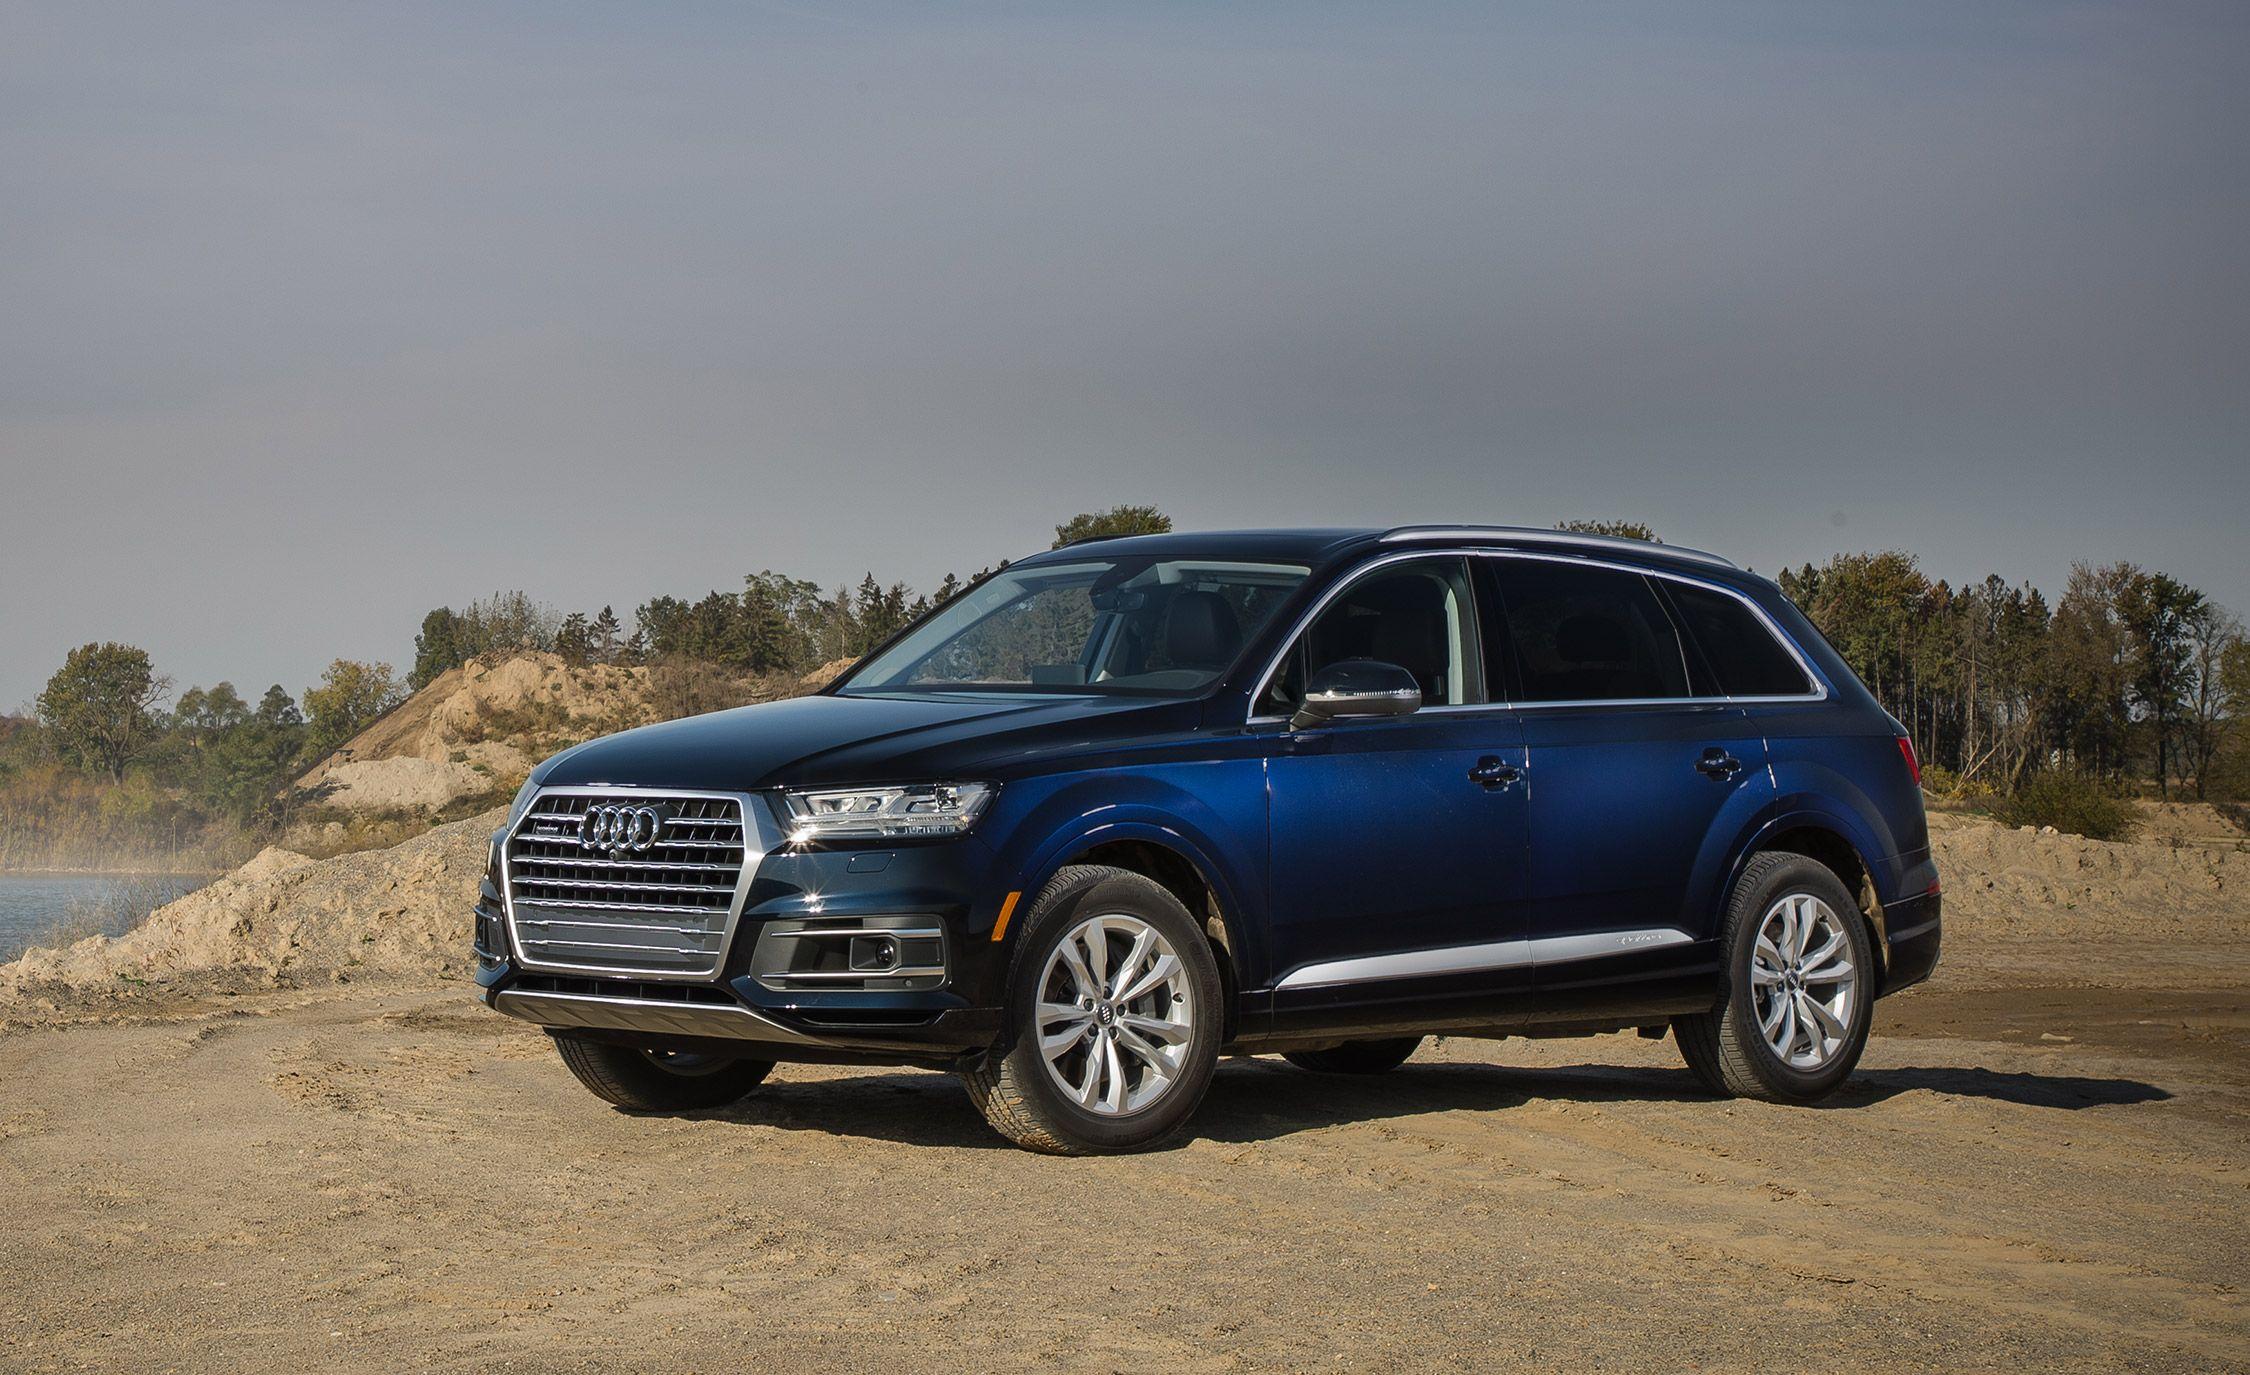 Audi Q7: Best Mid-Size Luxury SUV